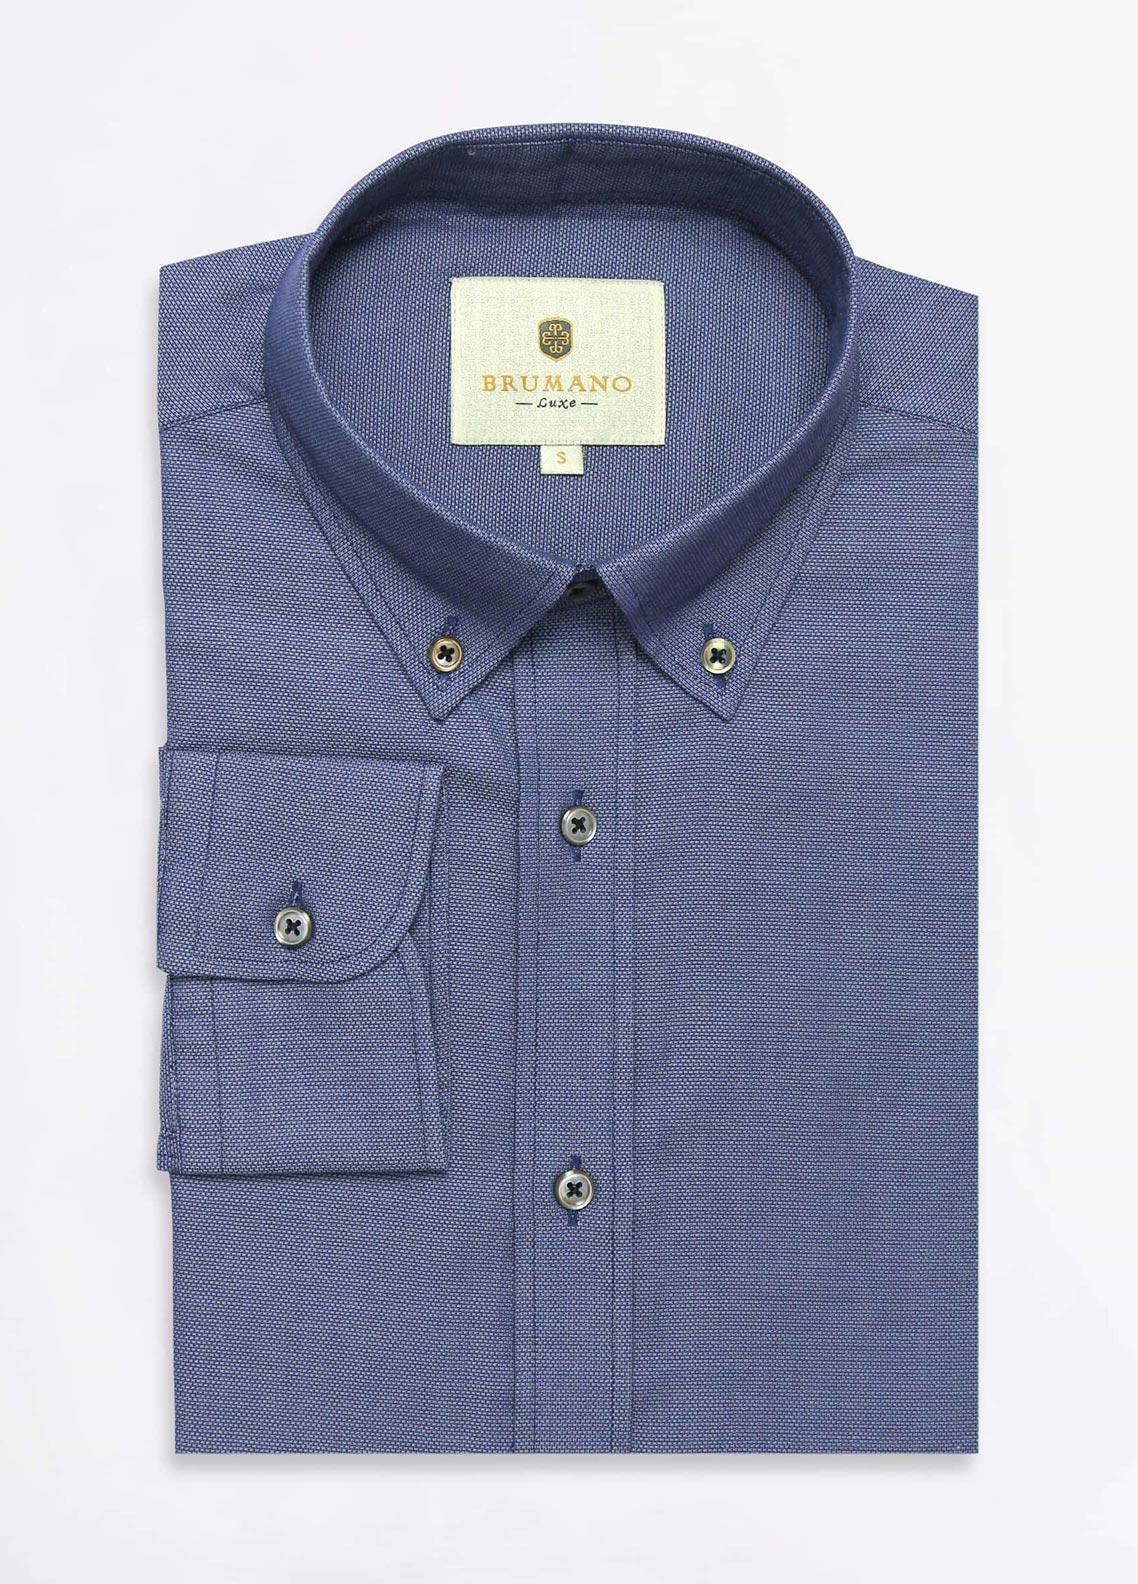 Brumano Cotton Formal Men Shirts -  BRM-593